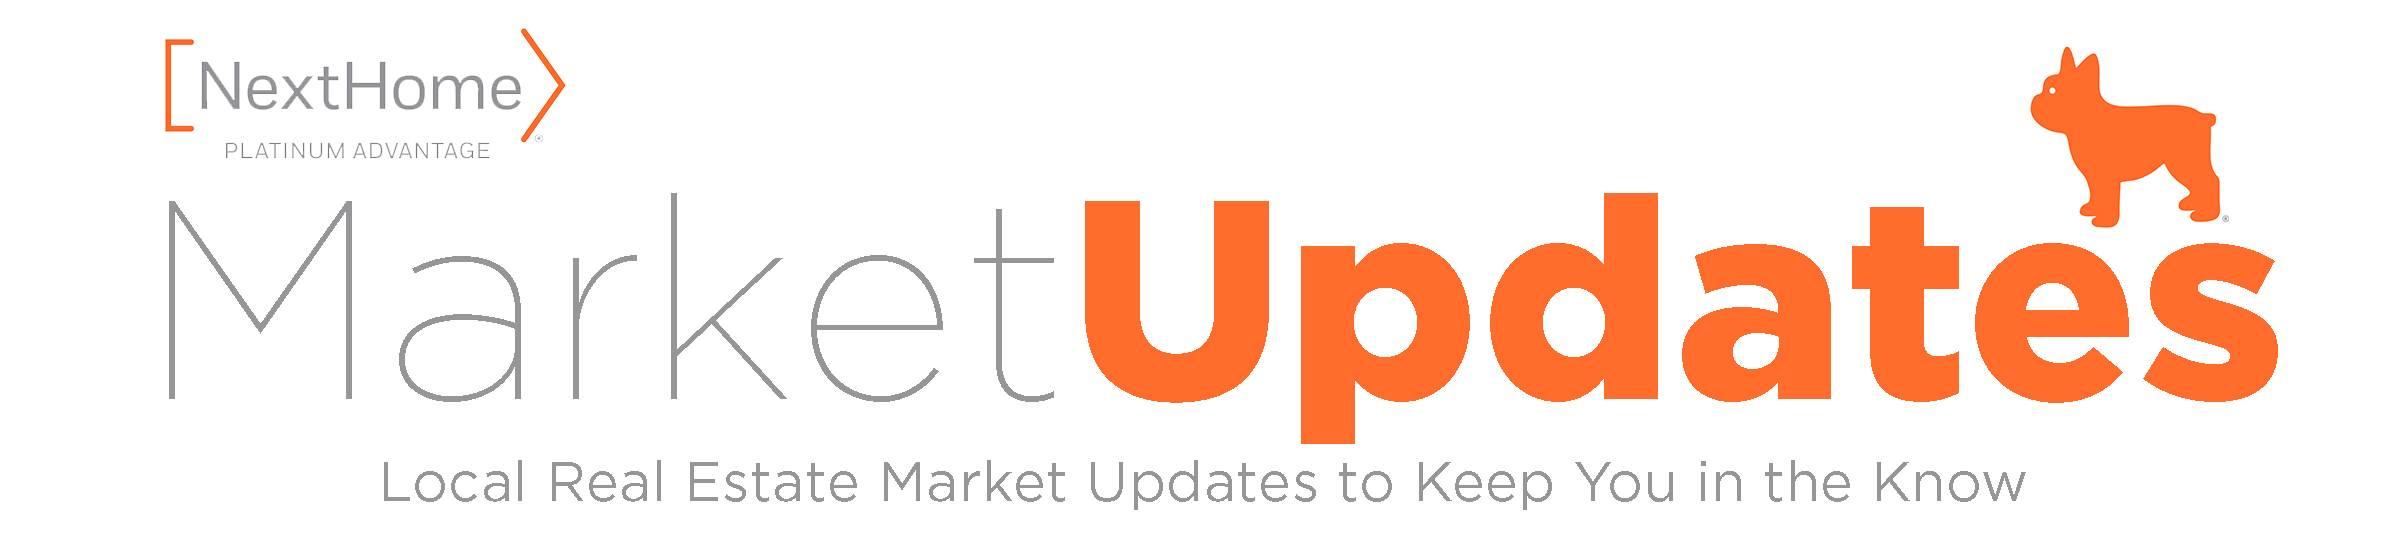 Local Real Estate Market Updates